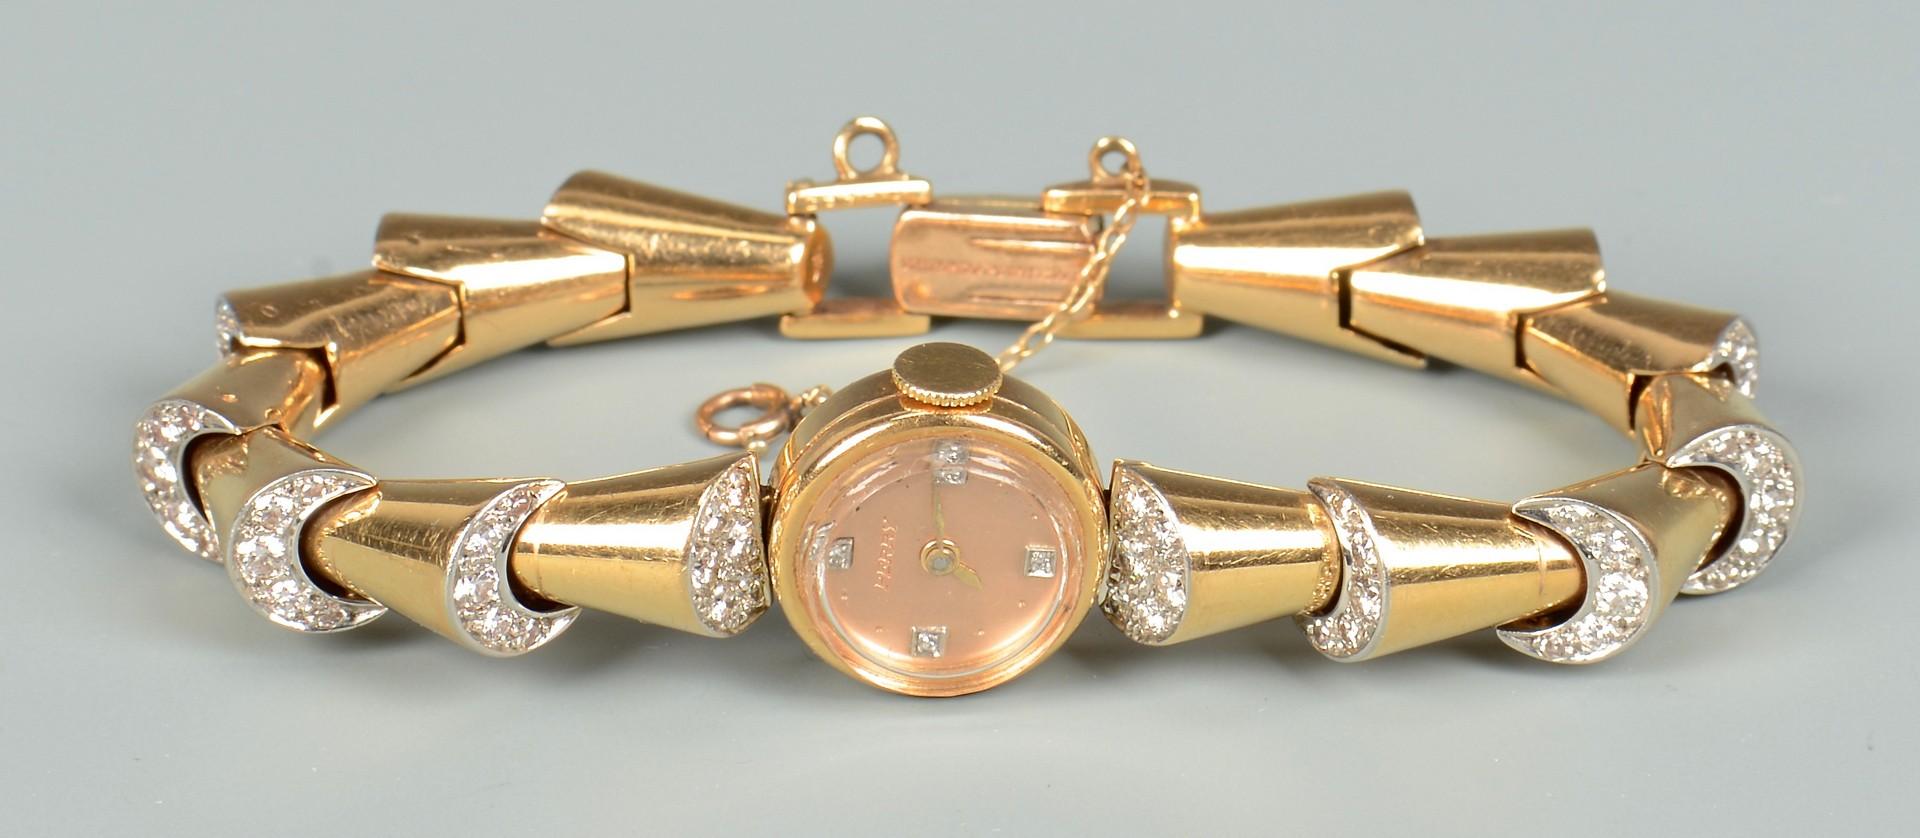 Lot 79: George Headley 18K Gold & Diamond Watch